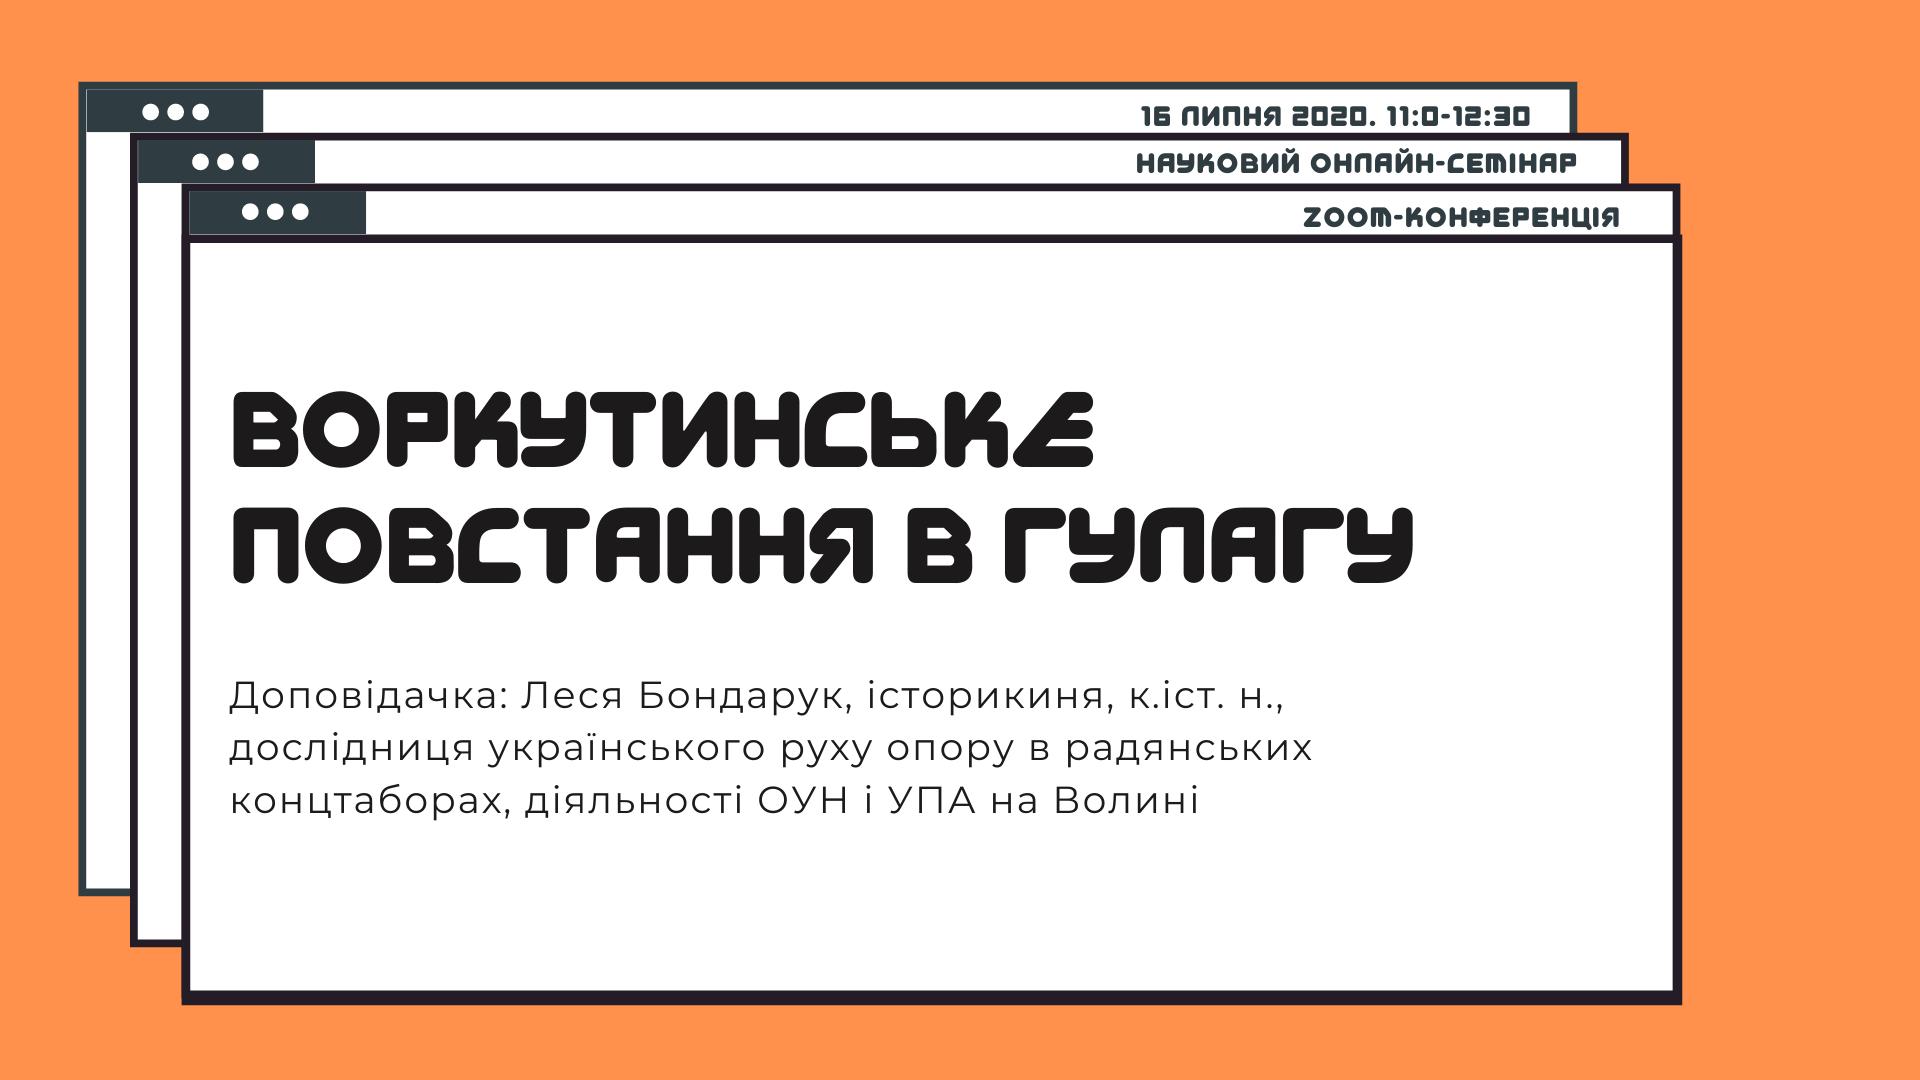 Воркутинське повстання в ГУЛАГу